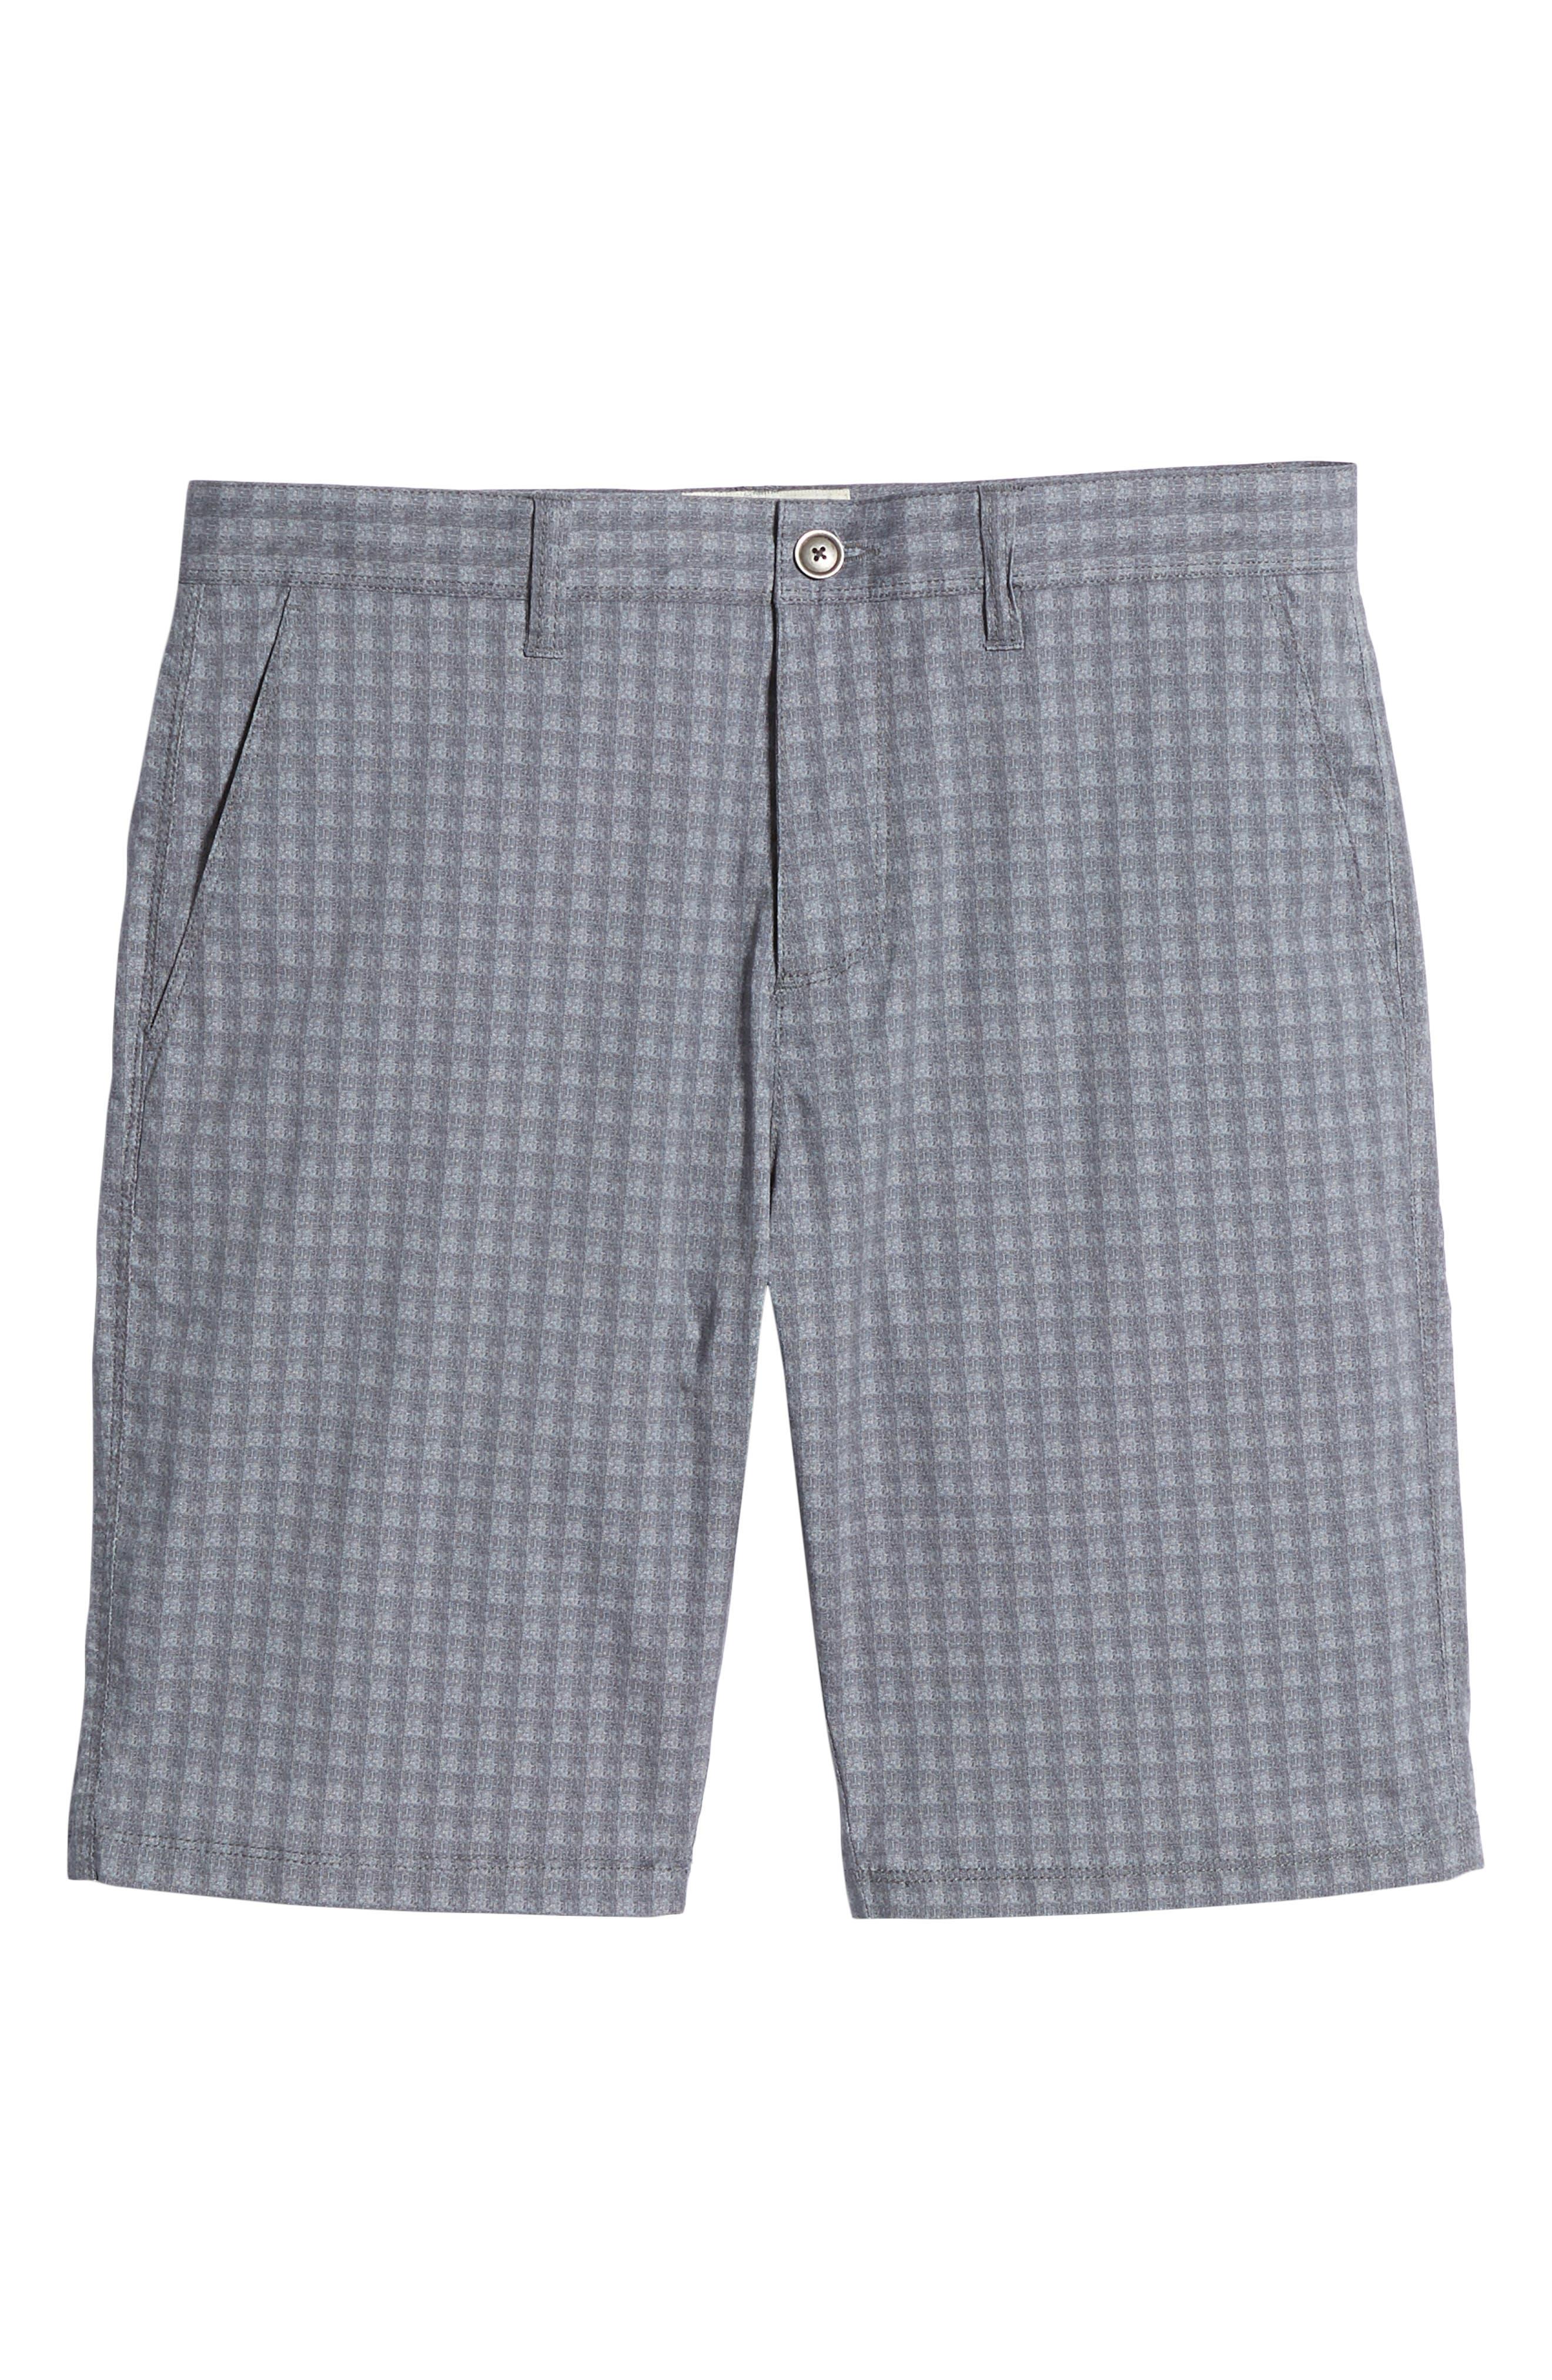 Tristen Check Shorts,                             Alternate thumbnail 6, color,                             020